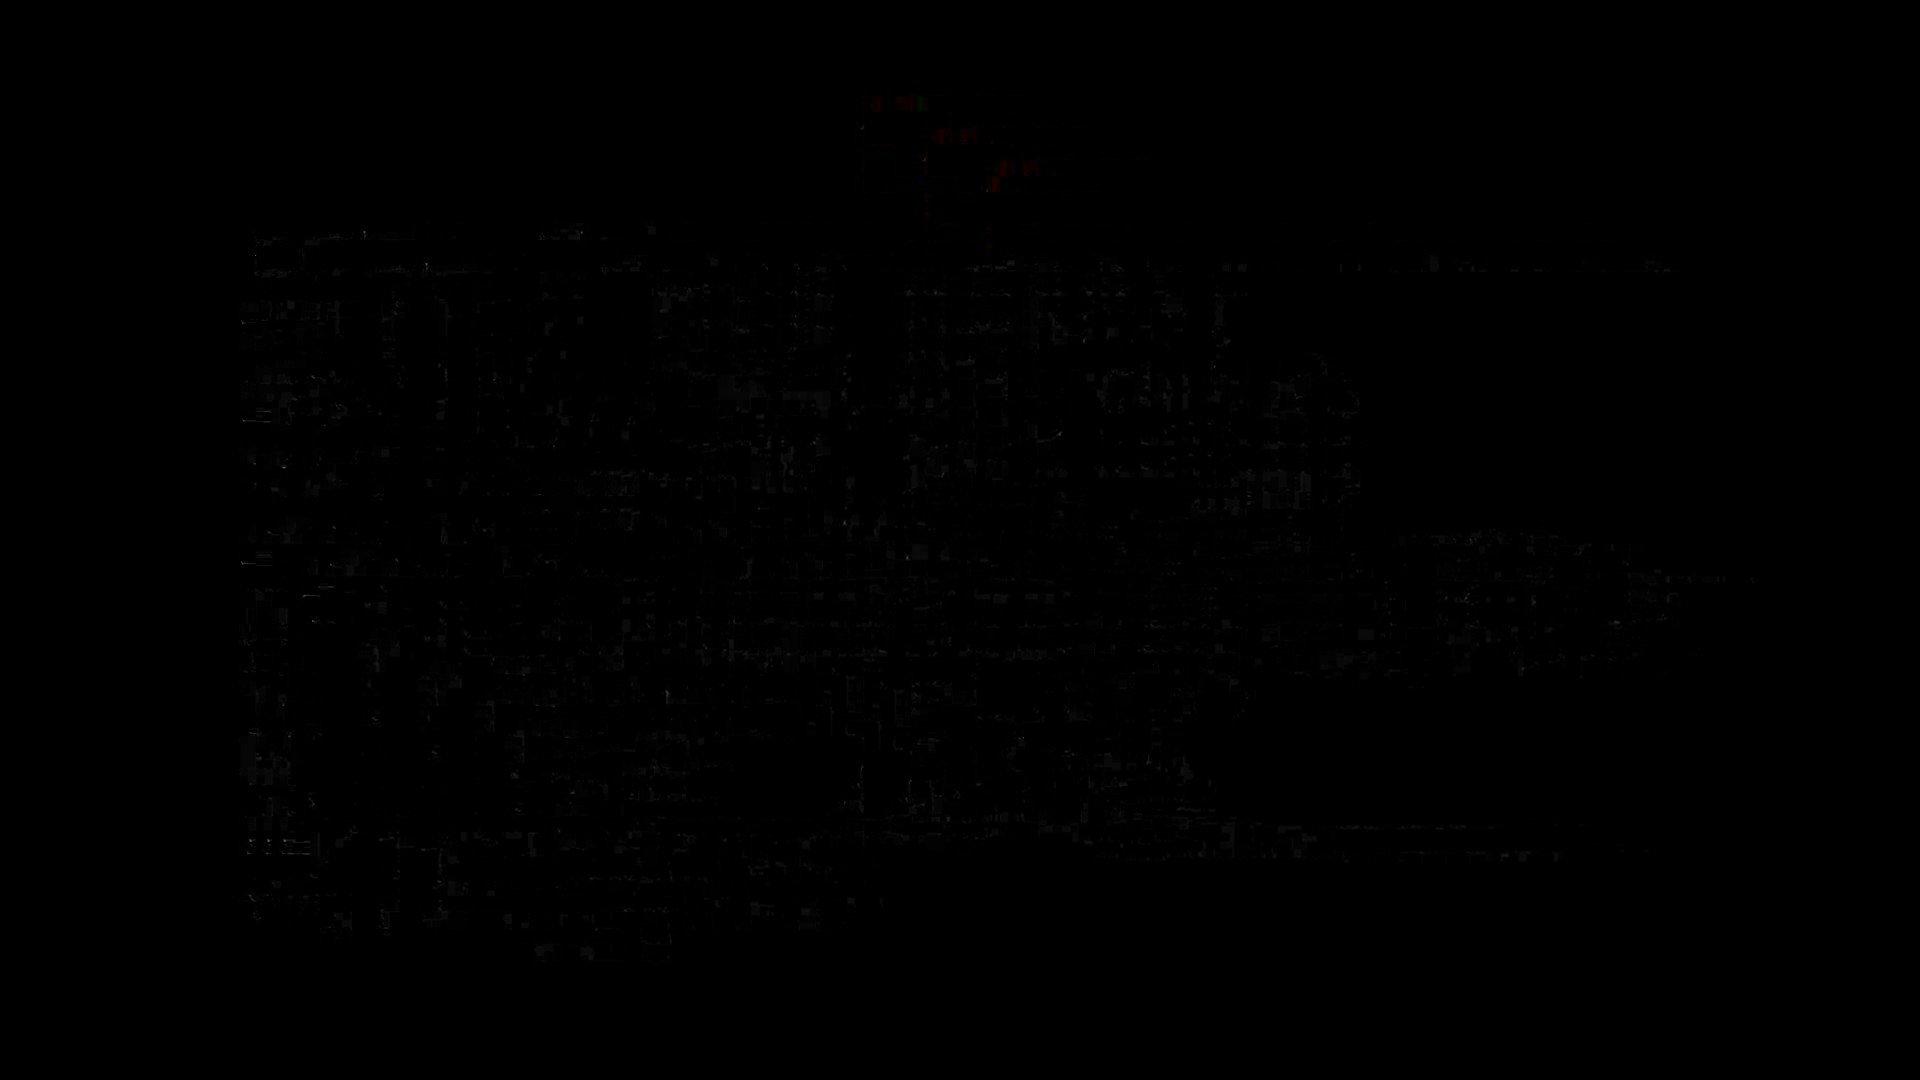 Aquaな露天風呂Vol.878潜入盗撮露天風呂十五判湯 其の八 潜入 | 盗撮  70枚 1